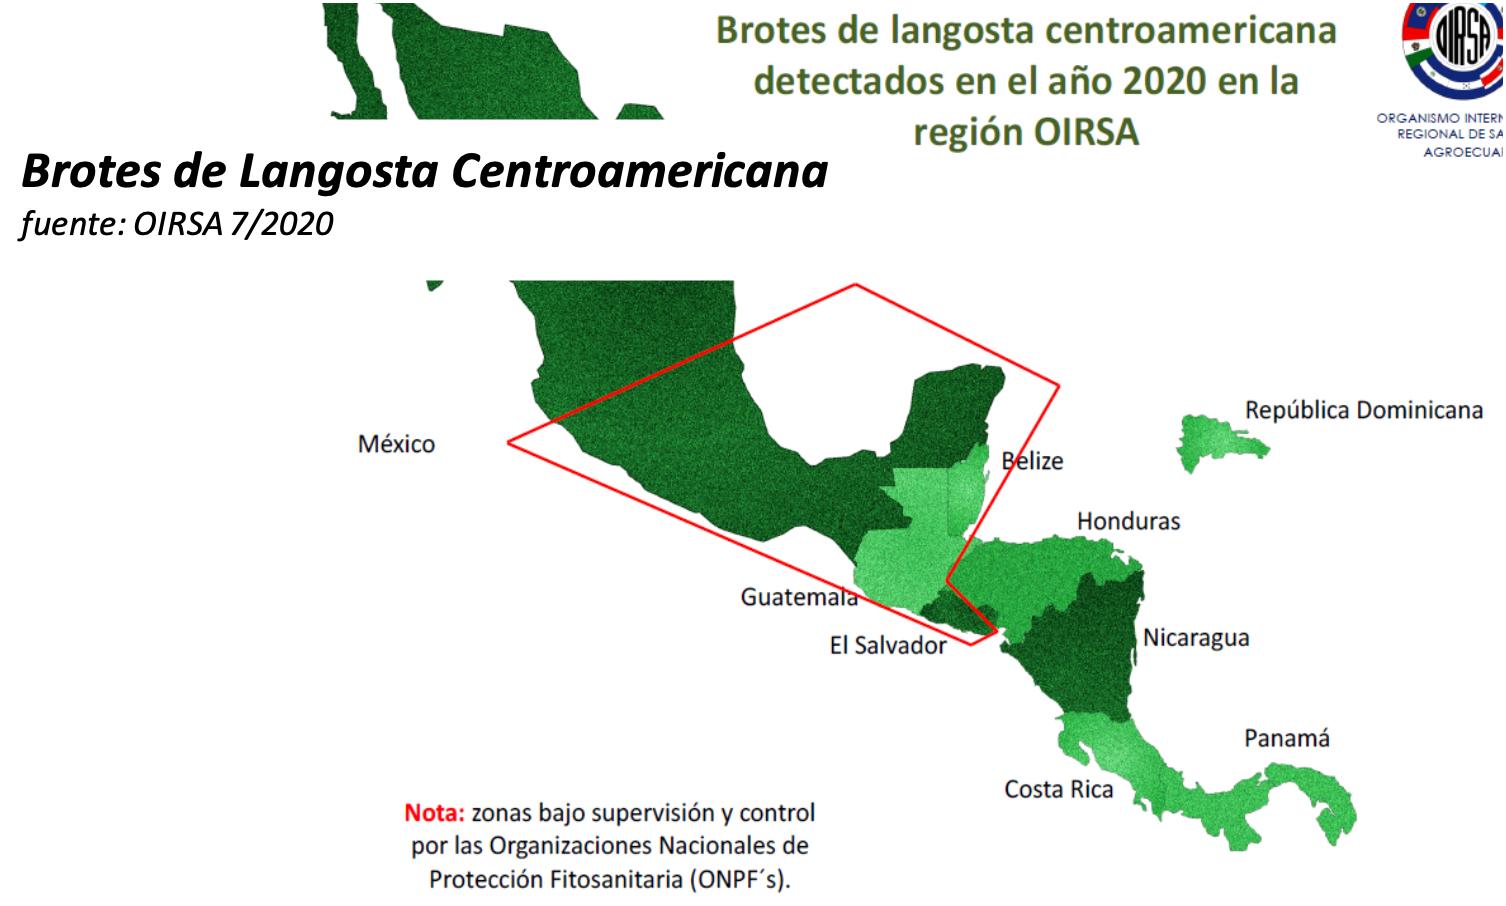 Brotes Langosta Centroamericana